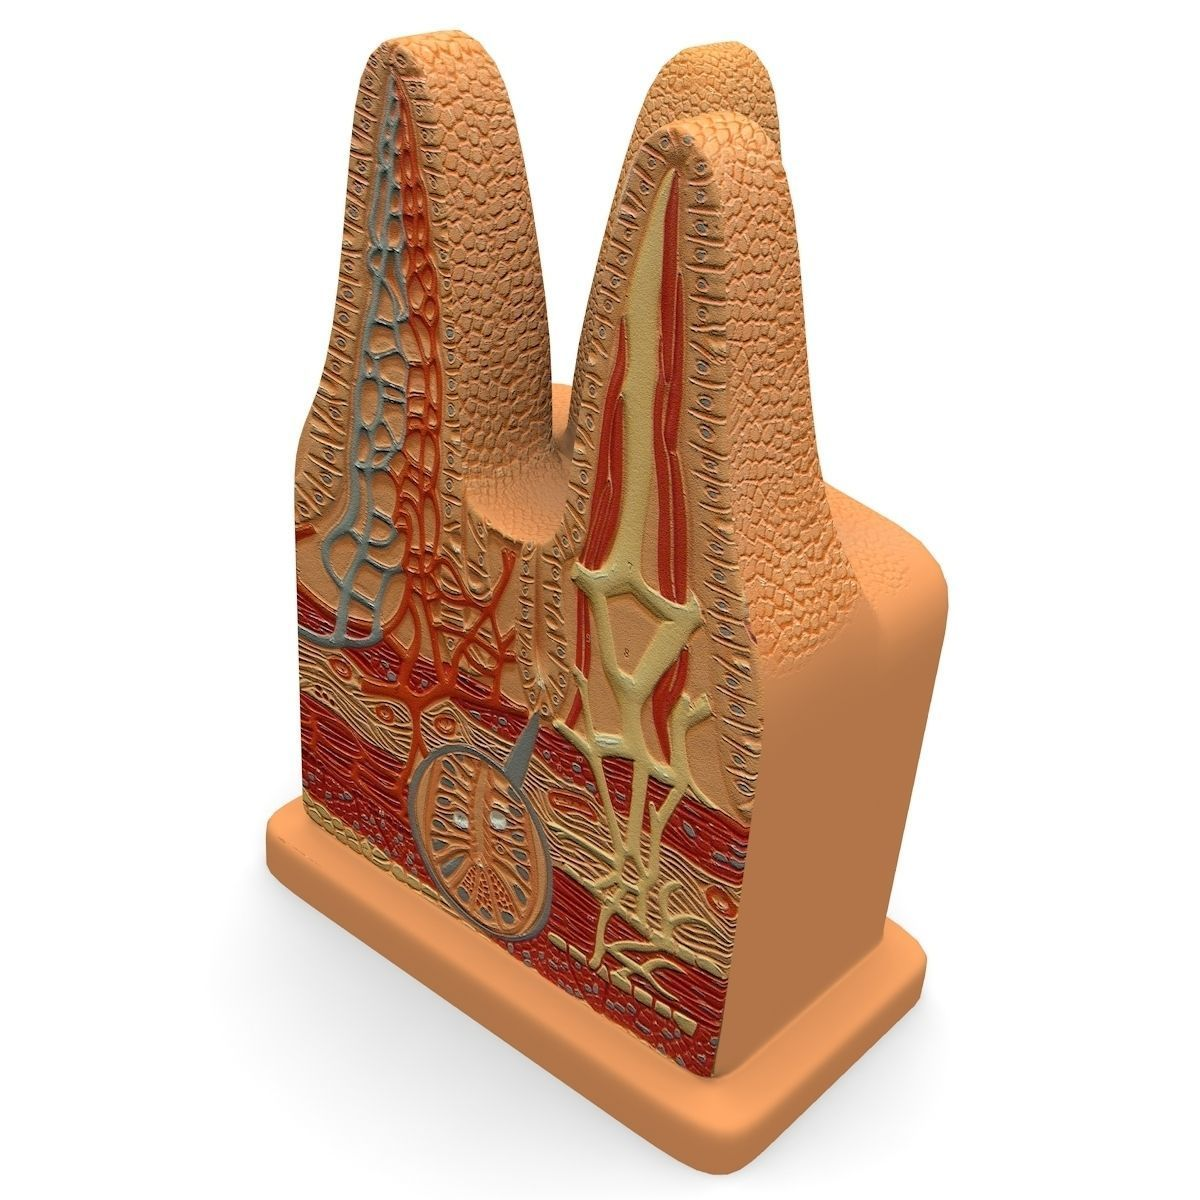 Microbiology Digestive Villi Intestinal 3d Model Cgtrader